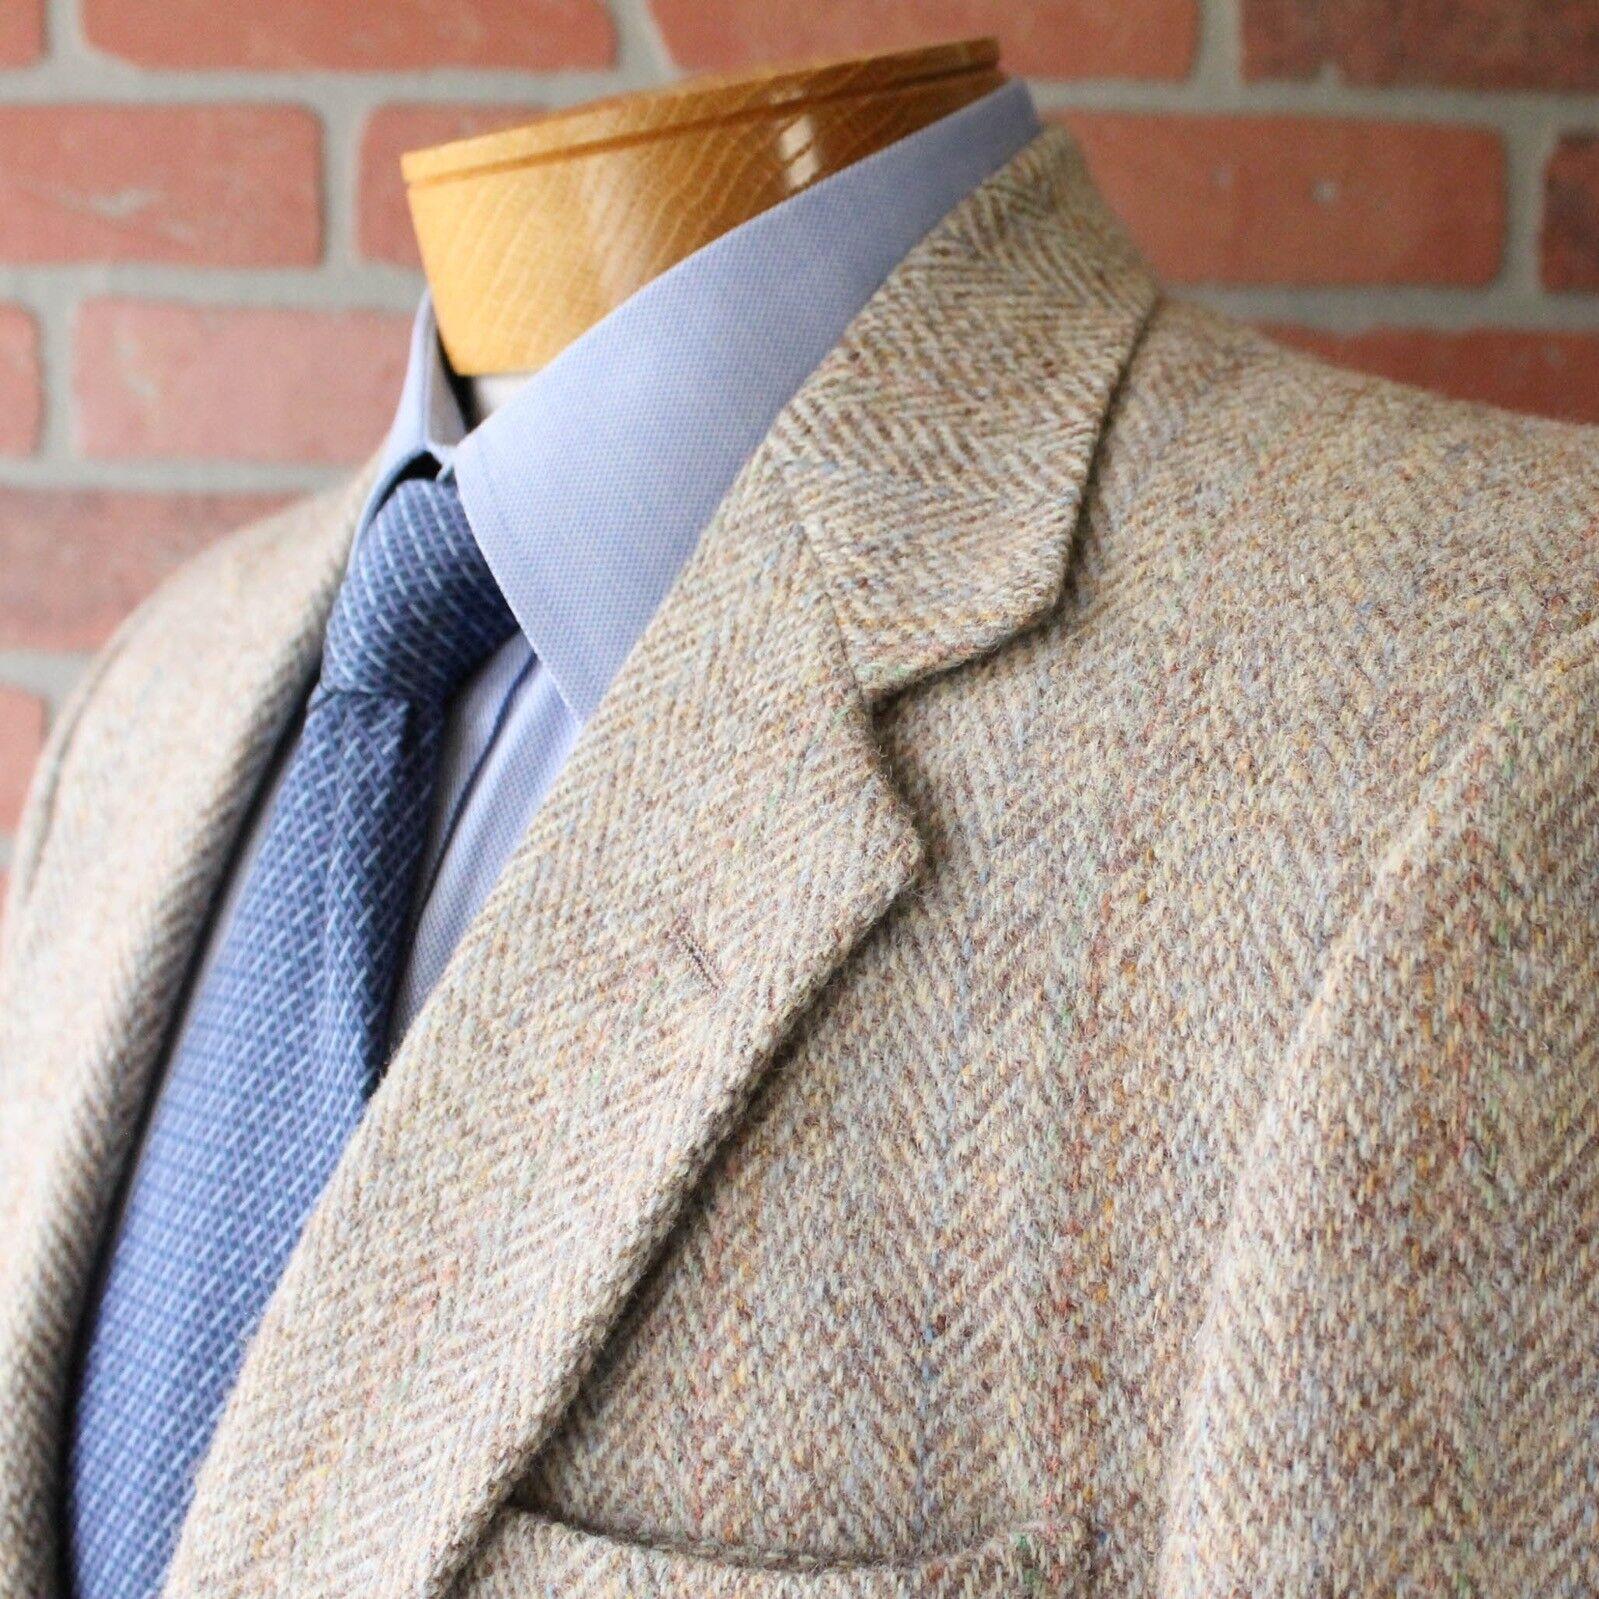 Harris Tweed Light Beige Pastel Accent Sportcoat Blazer 41R Wool Made in USA